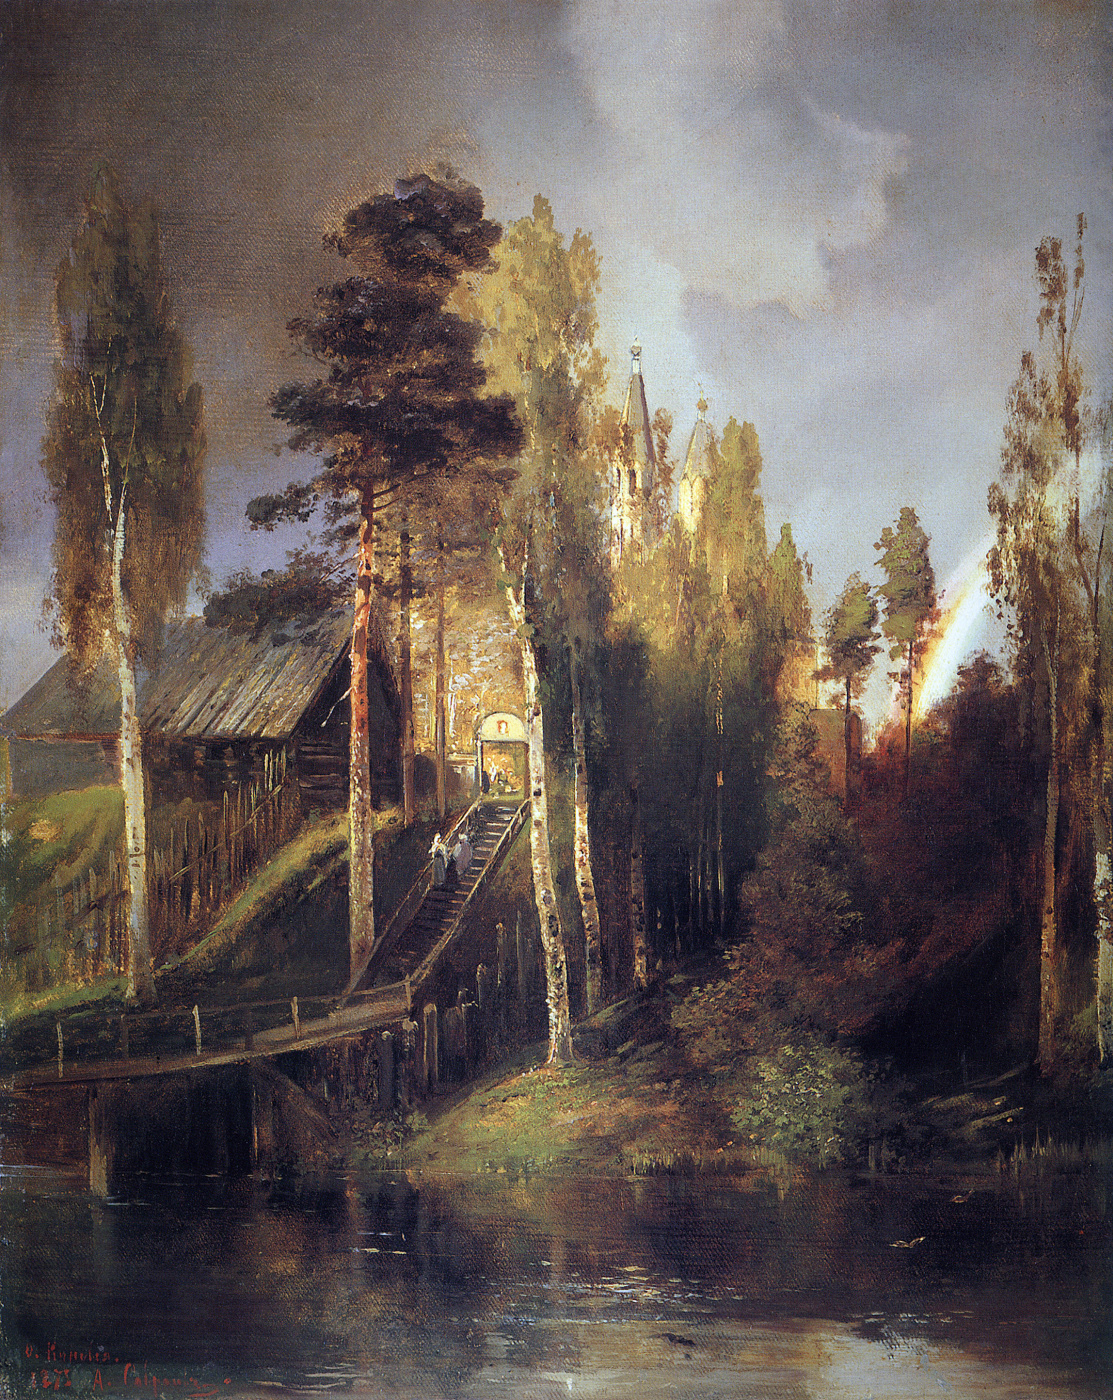 Alexey Savrasov. At the gate of the monastery